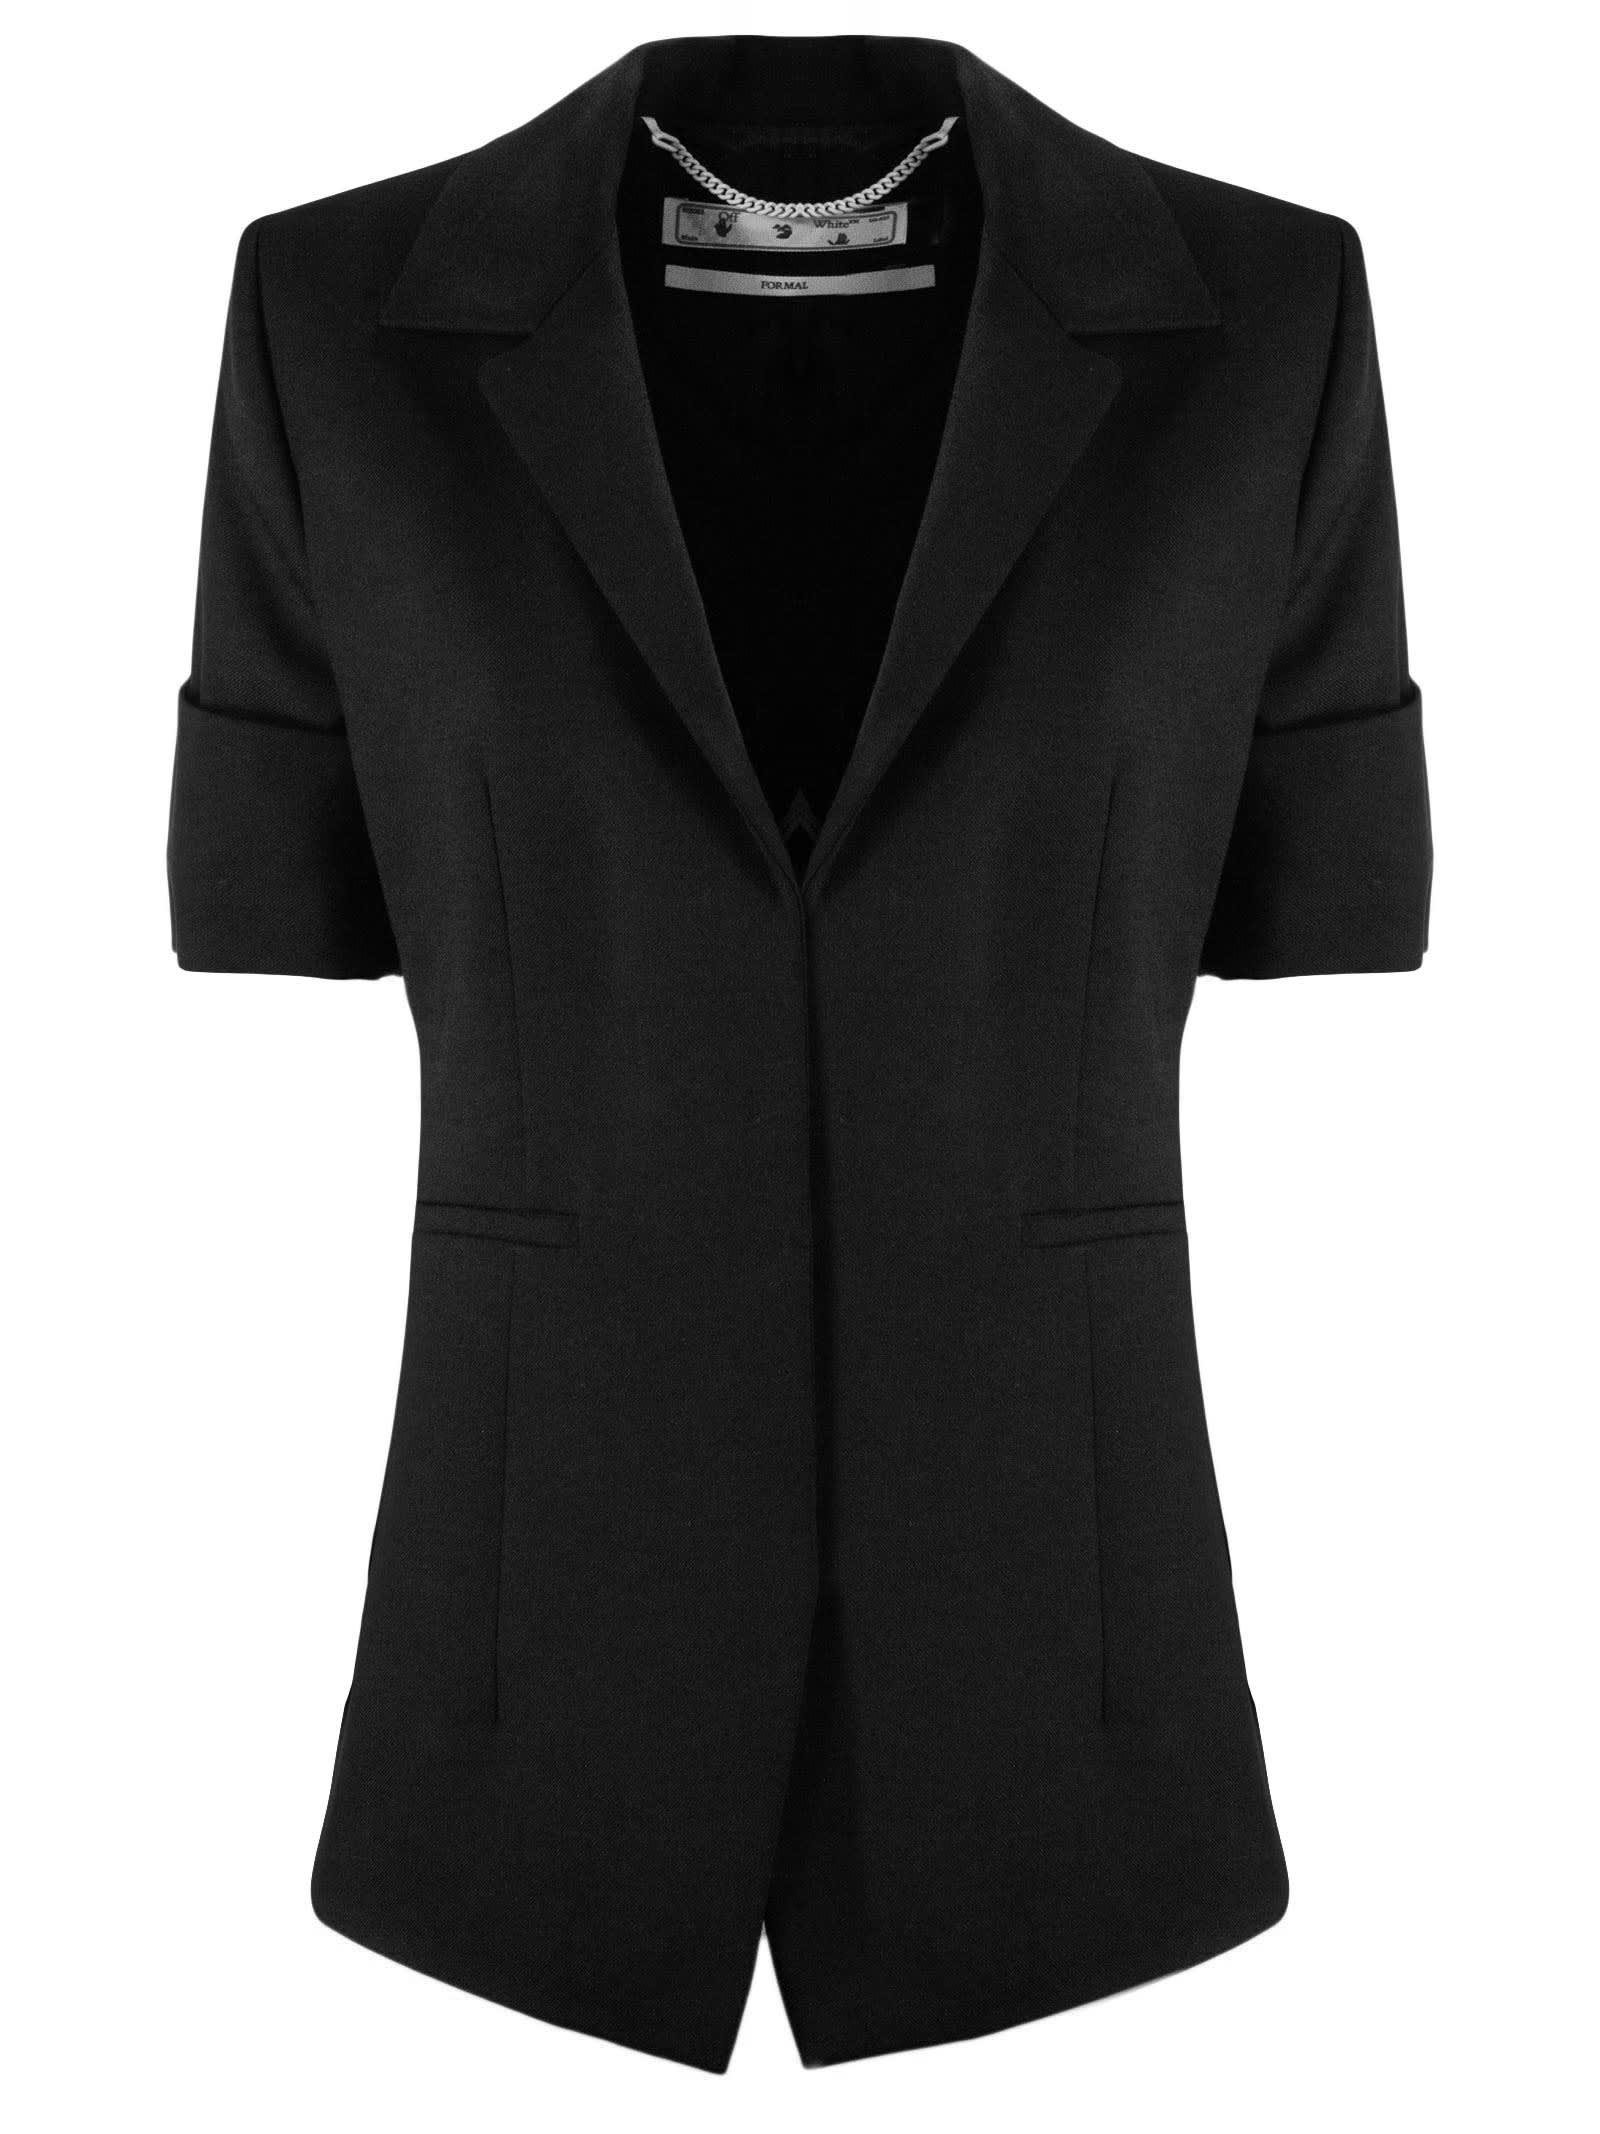 Off-White Black Virgin Wool Sailor Jacket